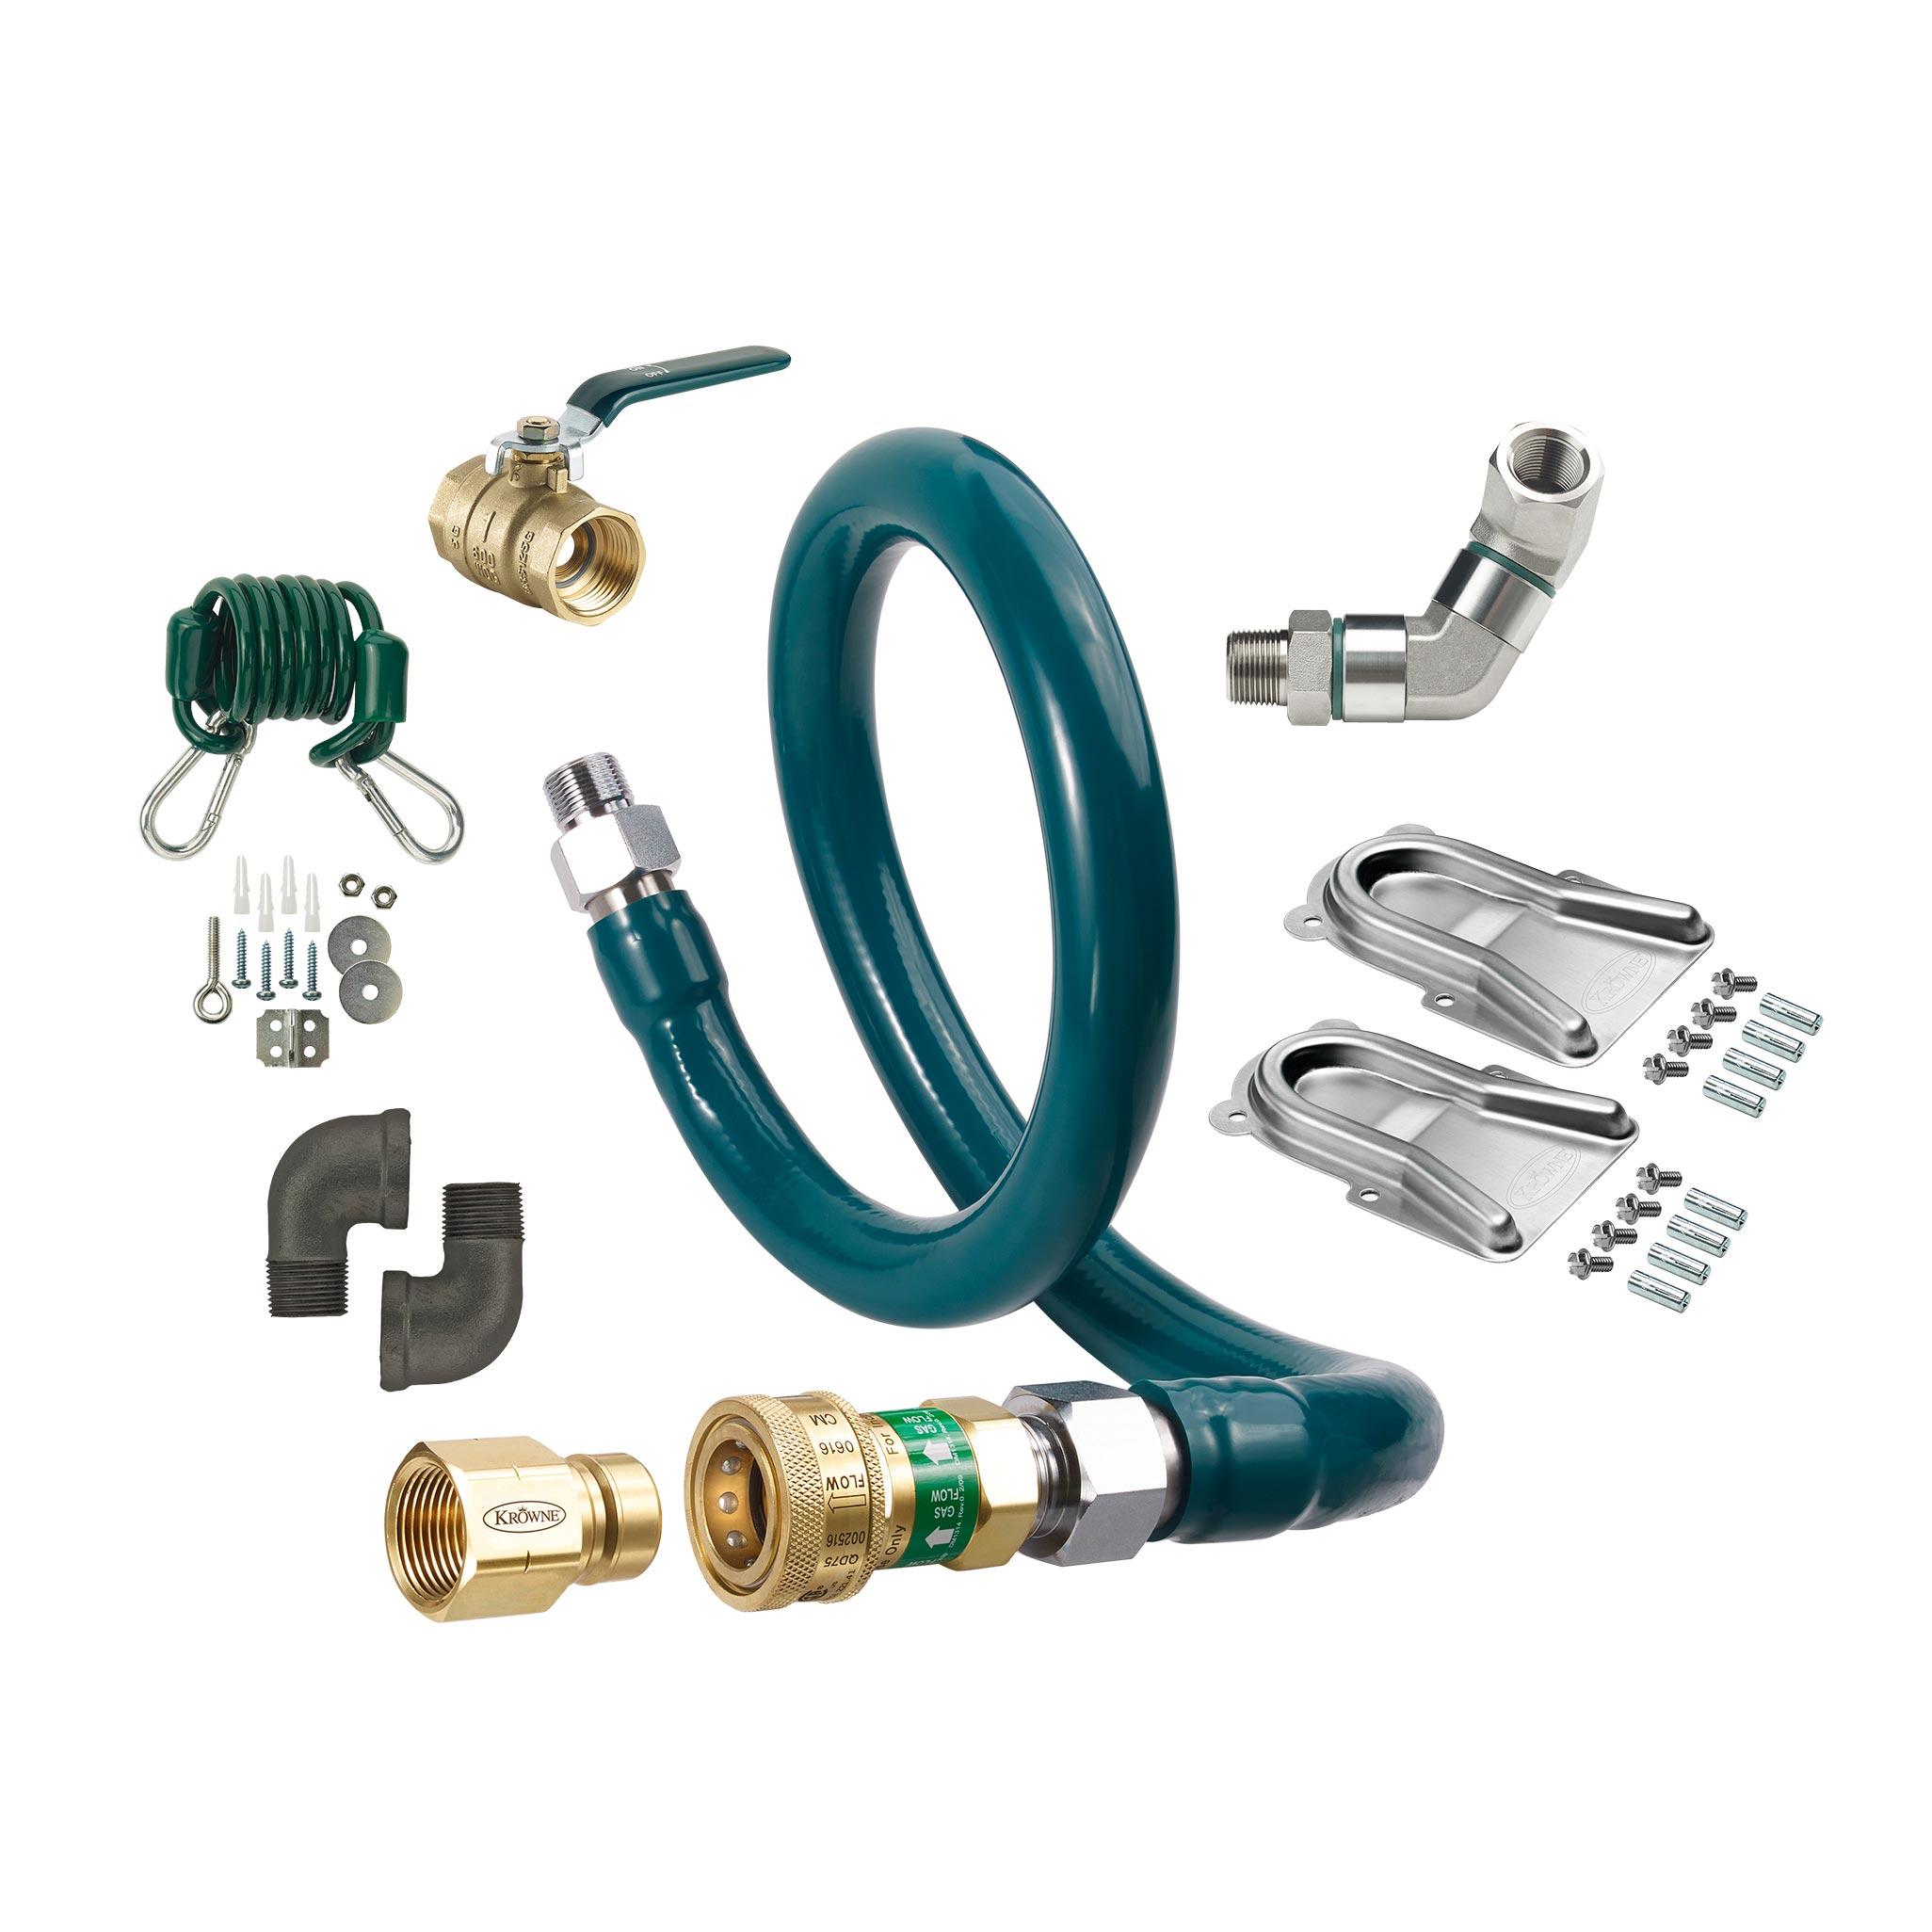 Krowne Metal M7536K11 gas connector hose kit